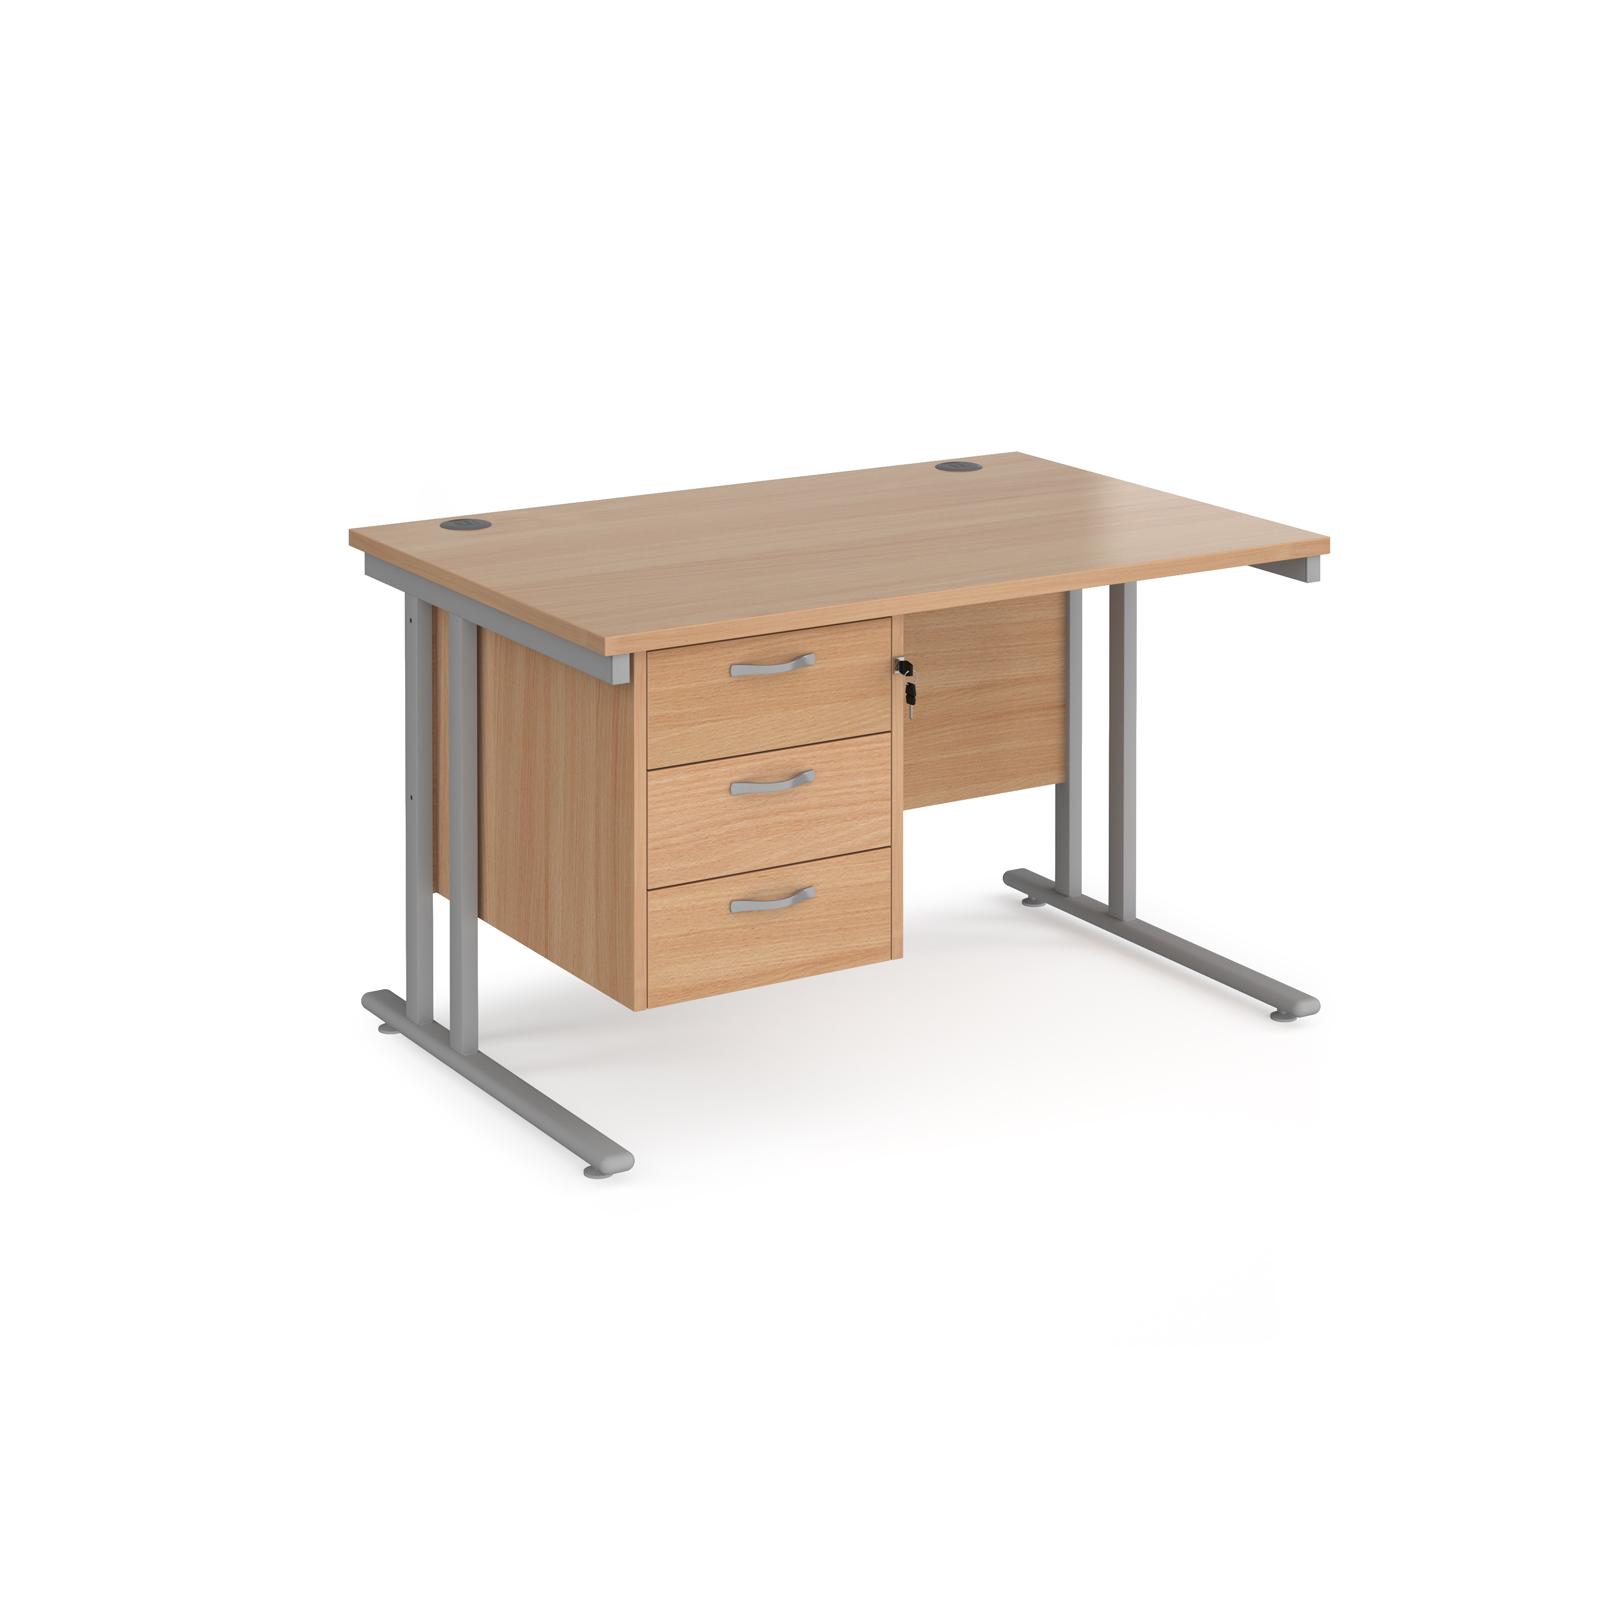 Rectangular Desks Maestro 25 straight desk 1200mm x 800mm with 3 drawer pedestal - silver cantilever leg frame, beech top